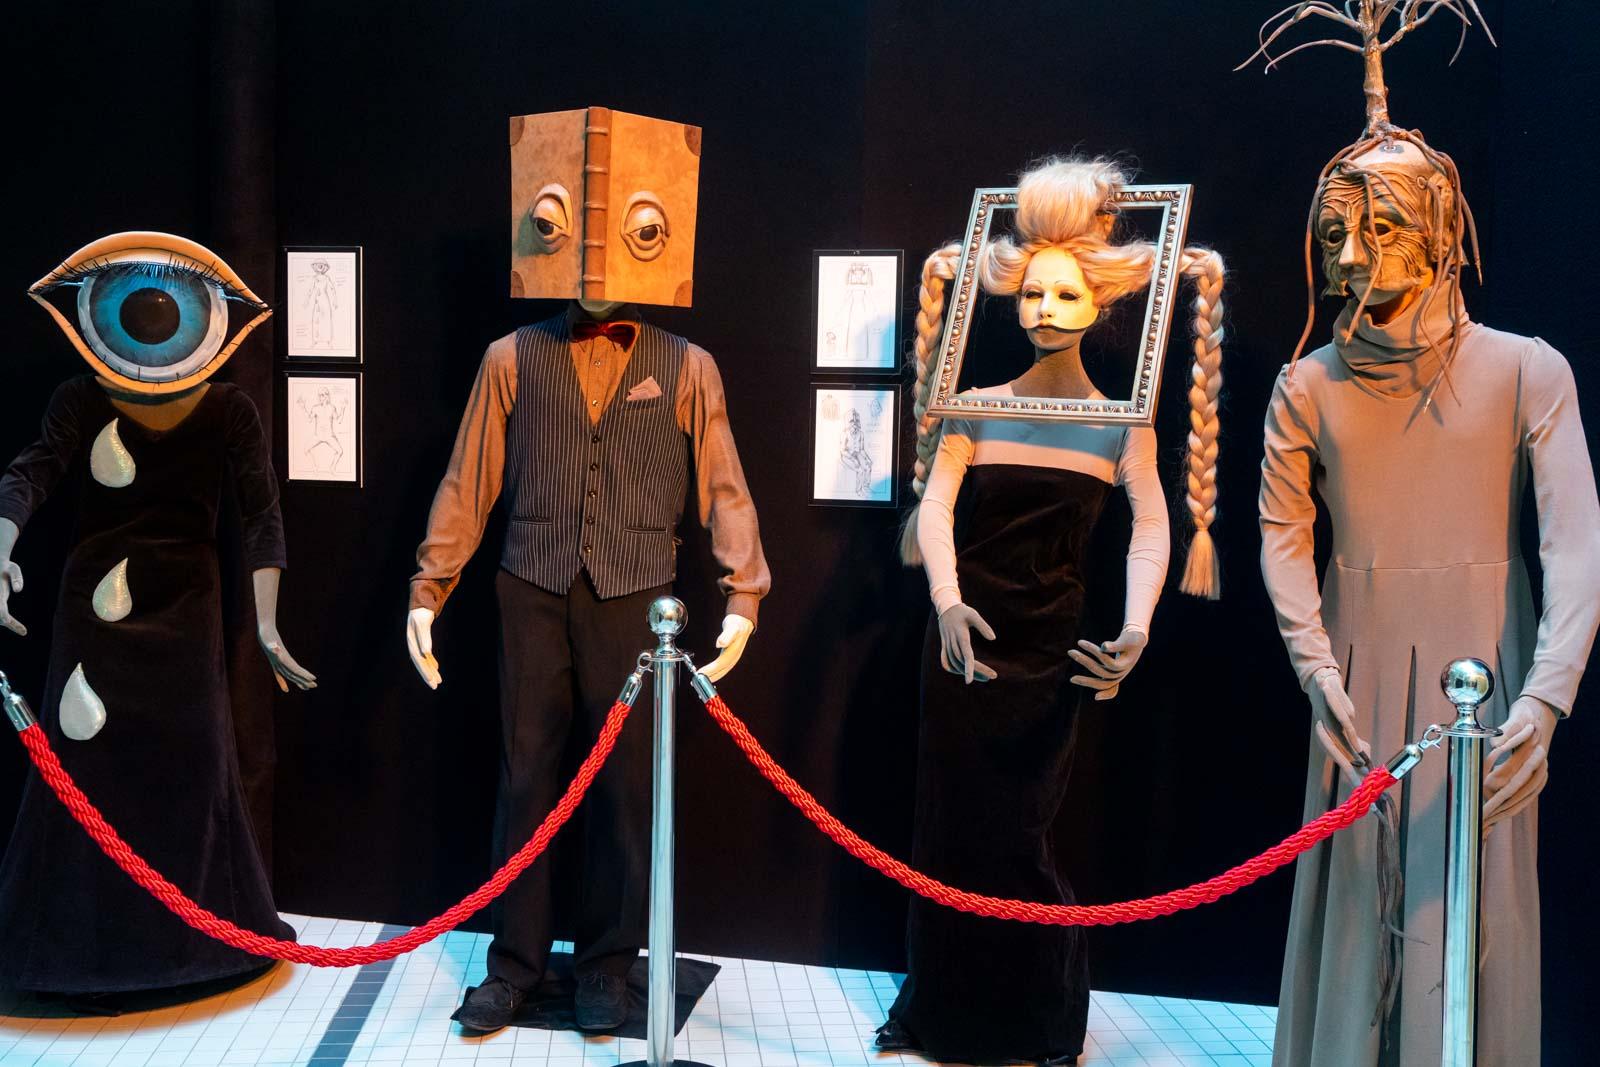 NUKU Museum of Puppet Arts, Tallinn, Estonia